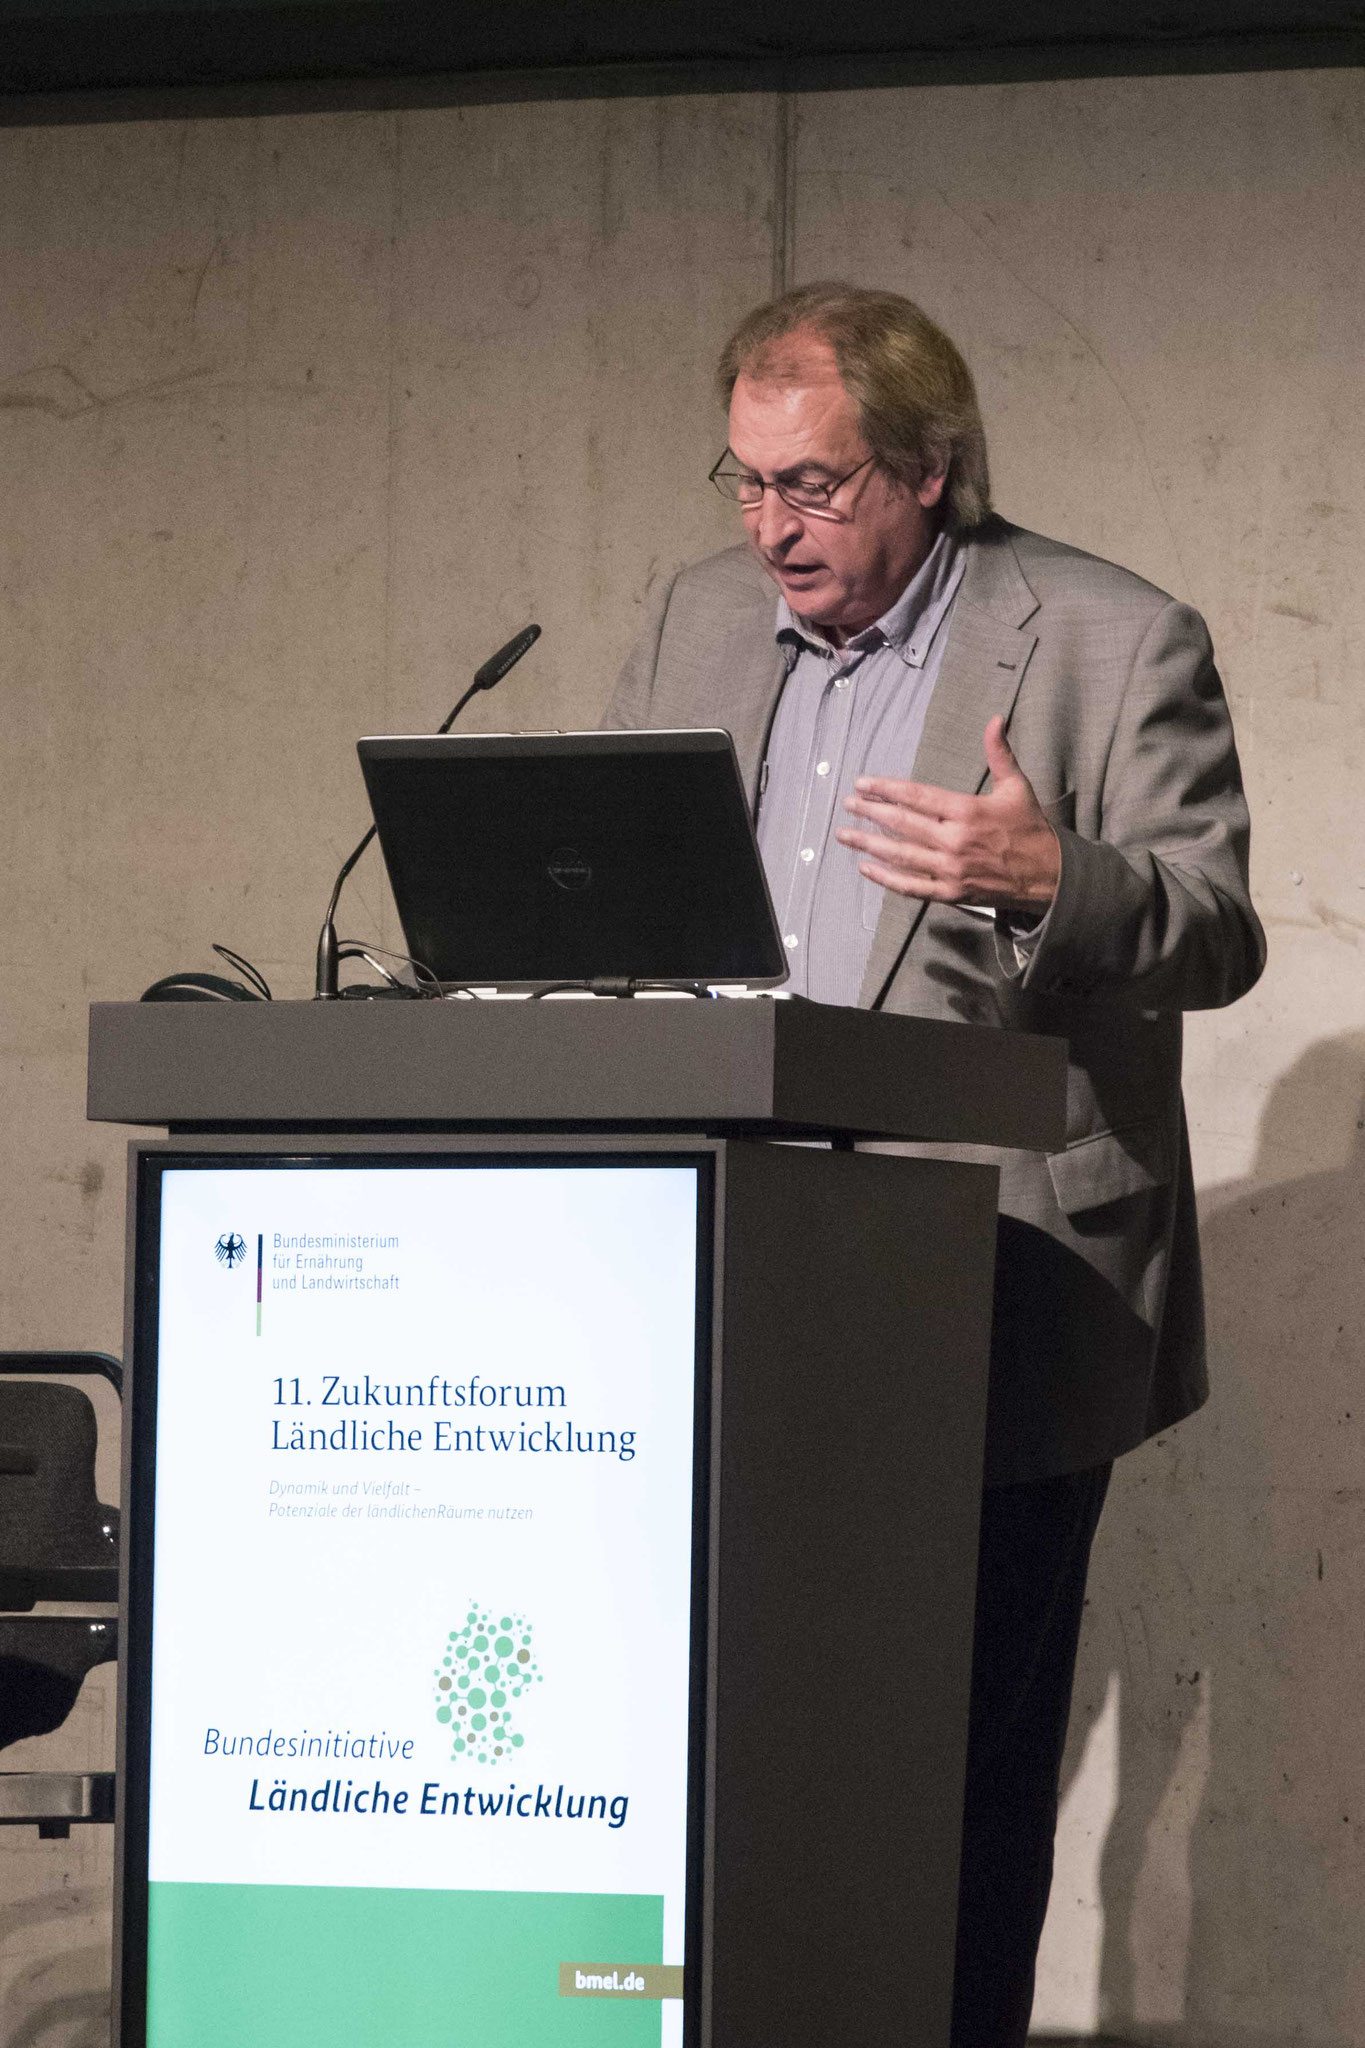 Dr. Jürgen Römer